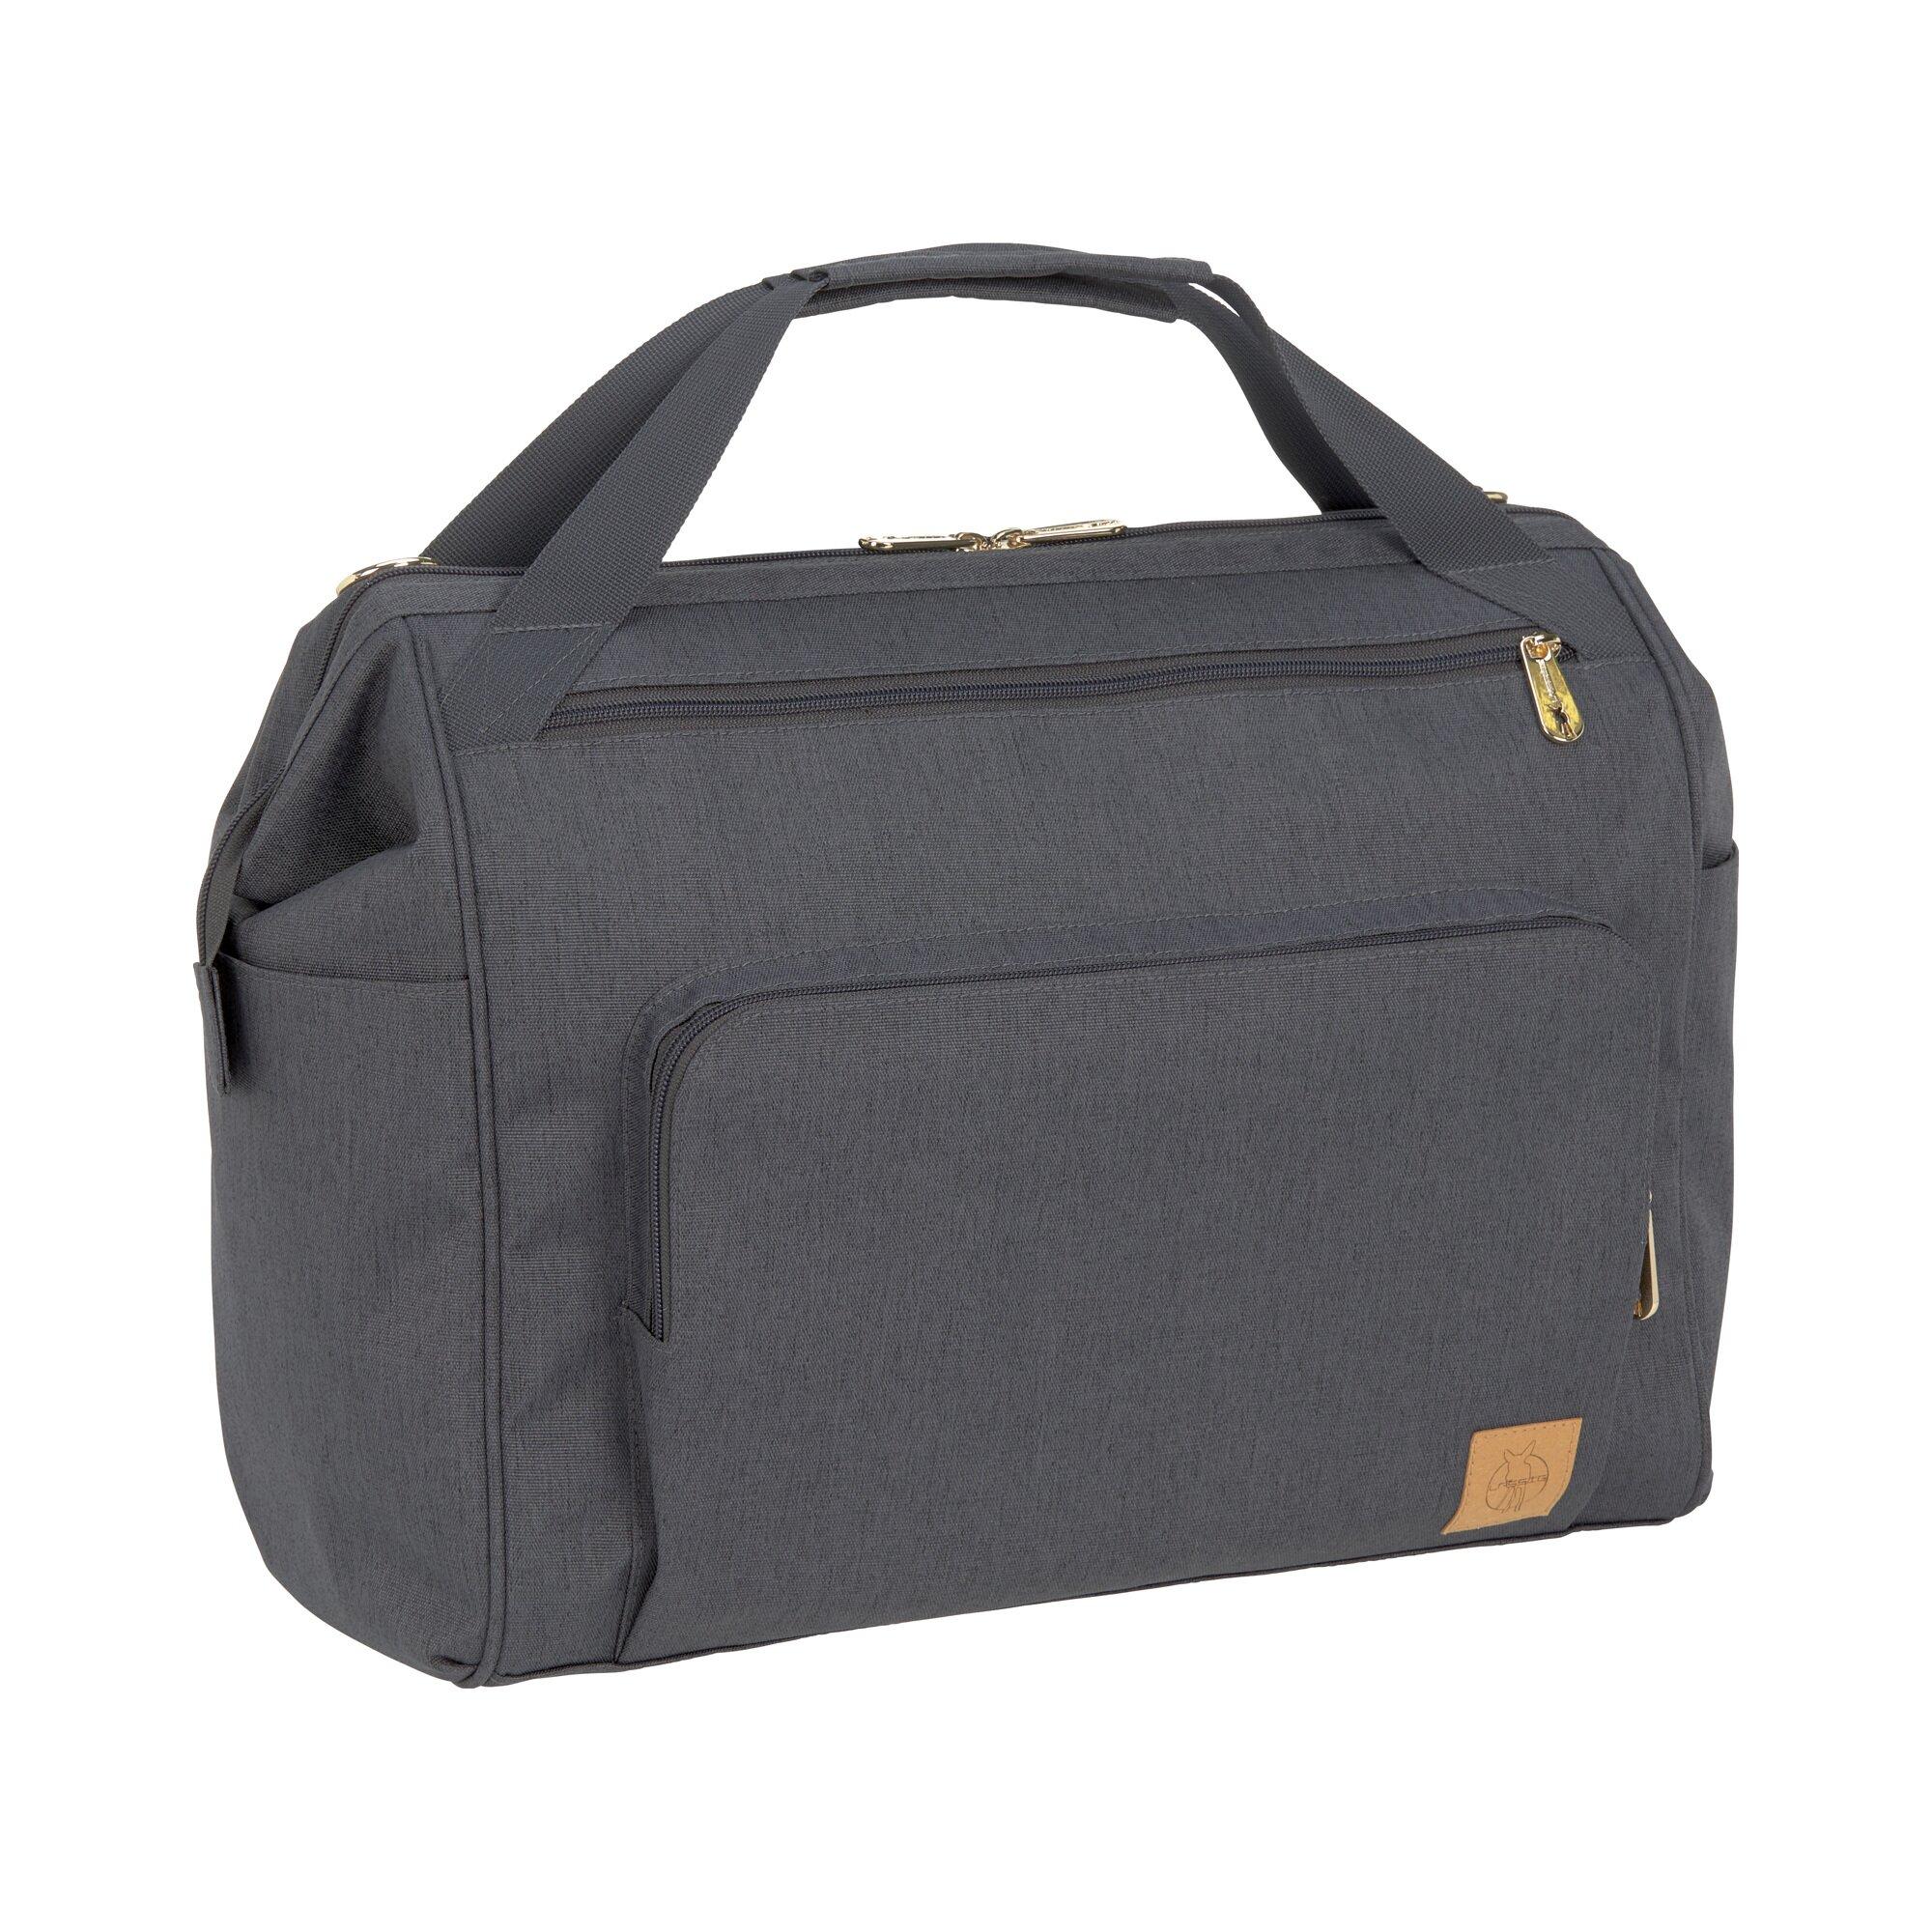 Glam Wickelrucksack Twin Backpack grau